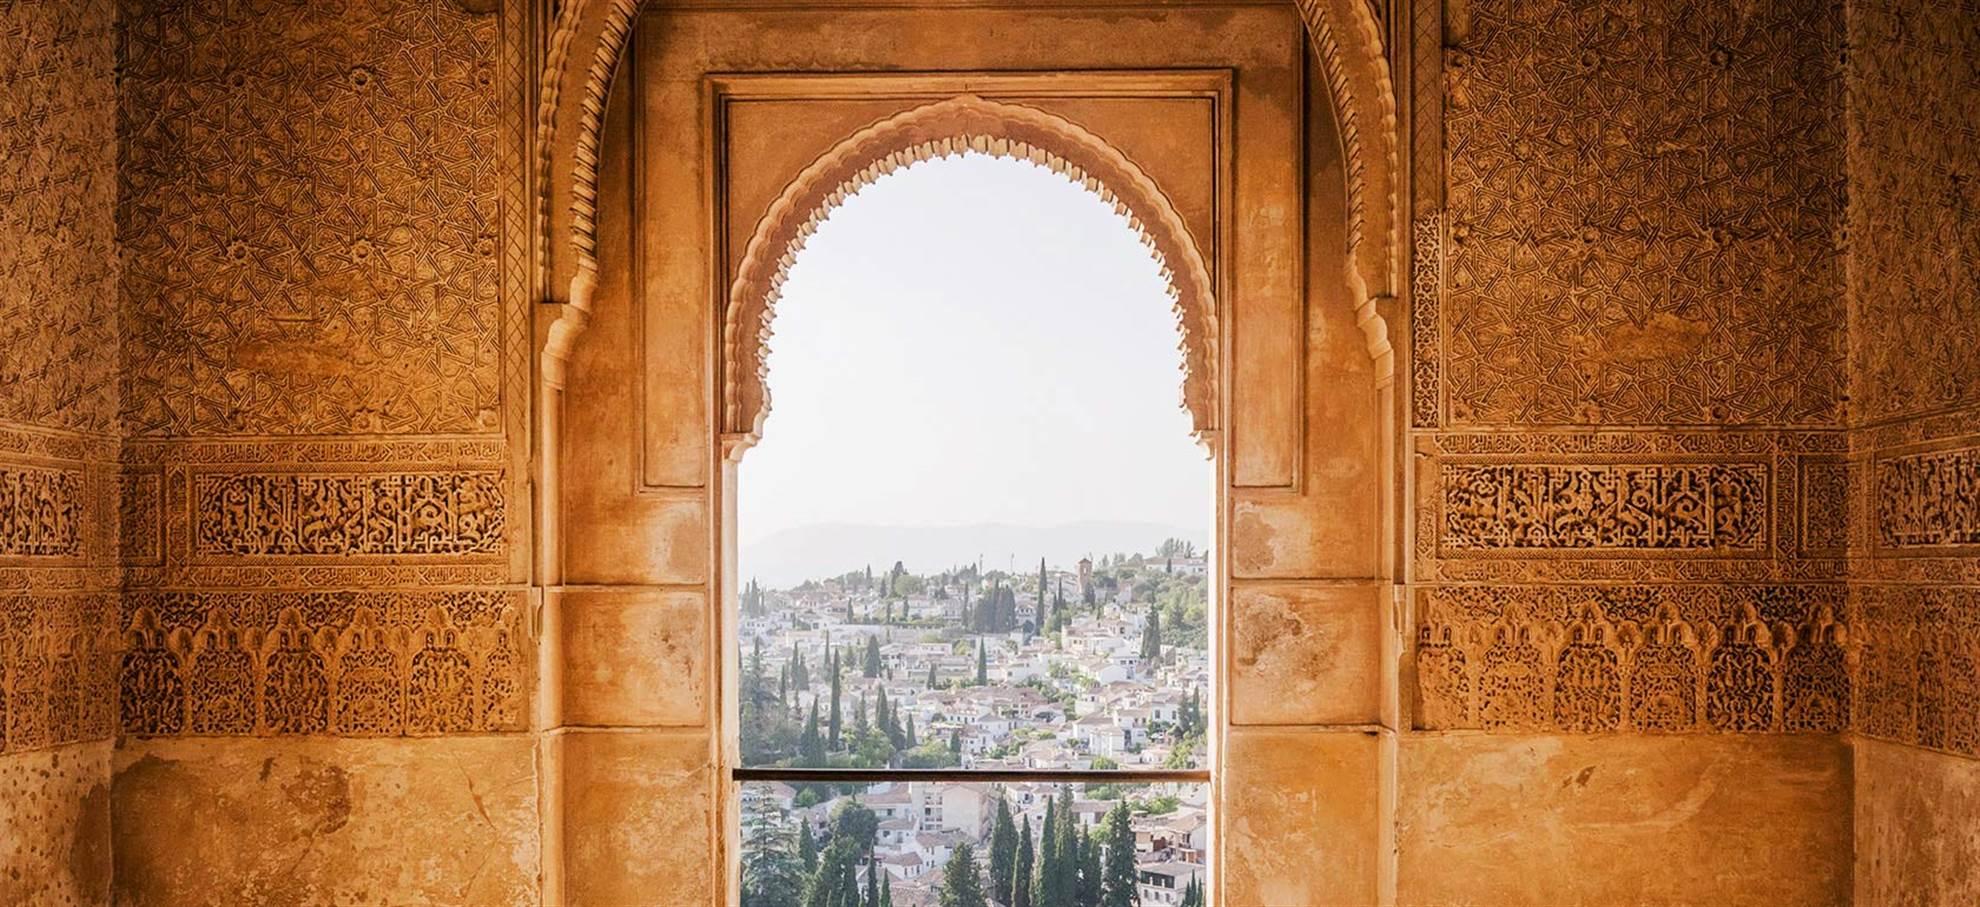 Alhambra Card – La visita mattutina (8:30h) - ingresso salta-fila